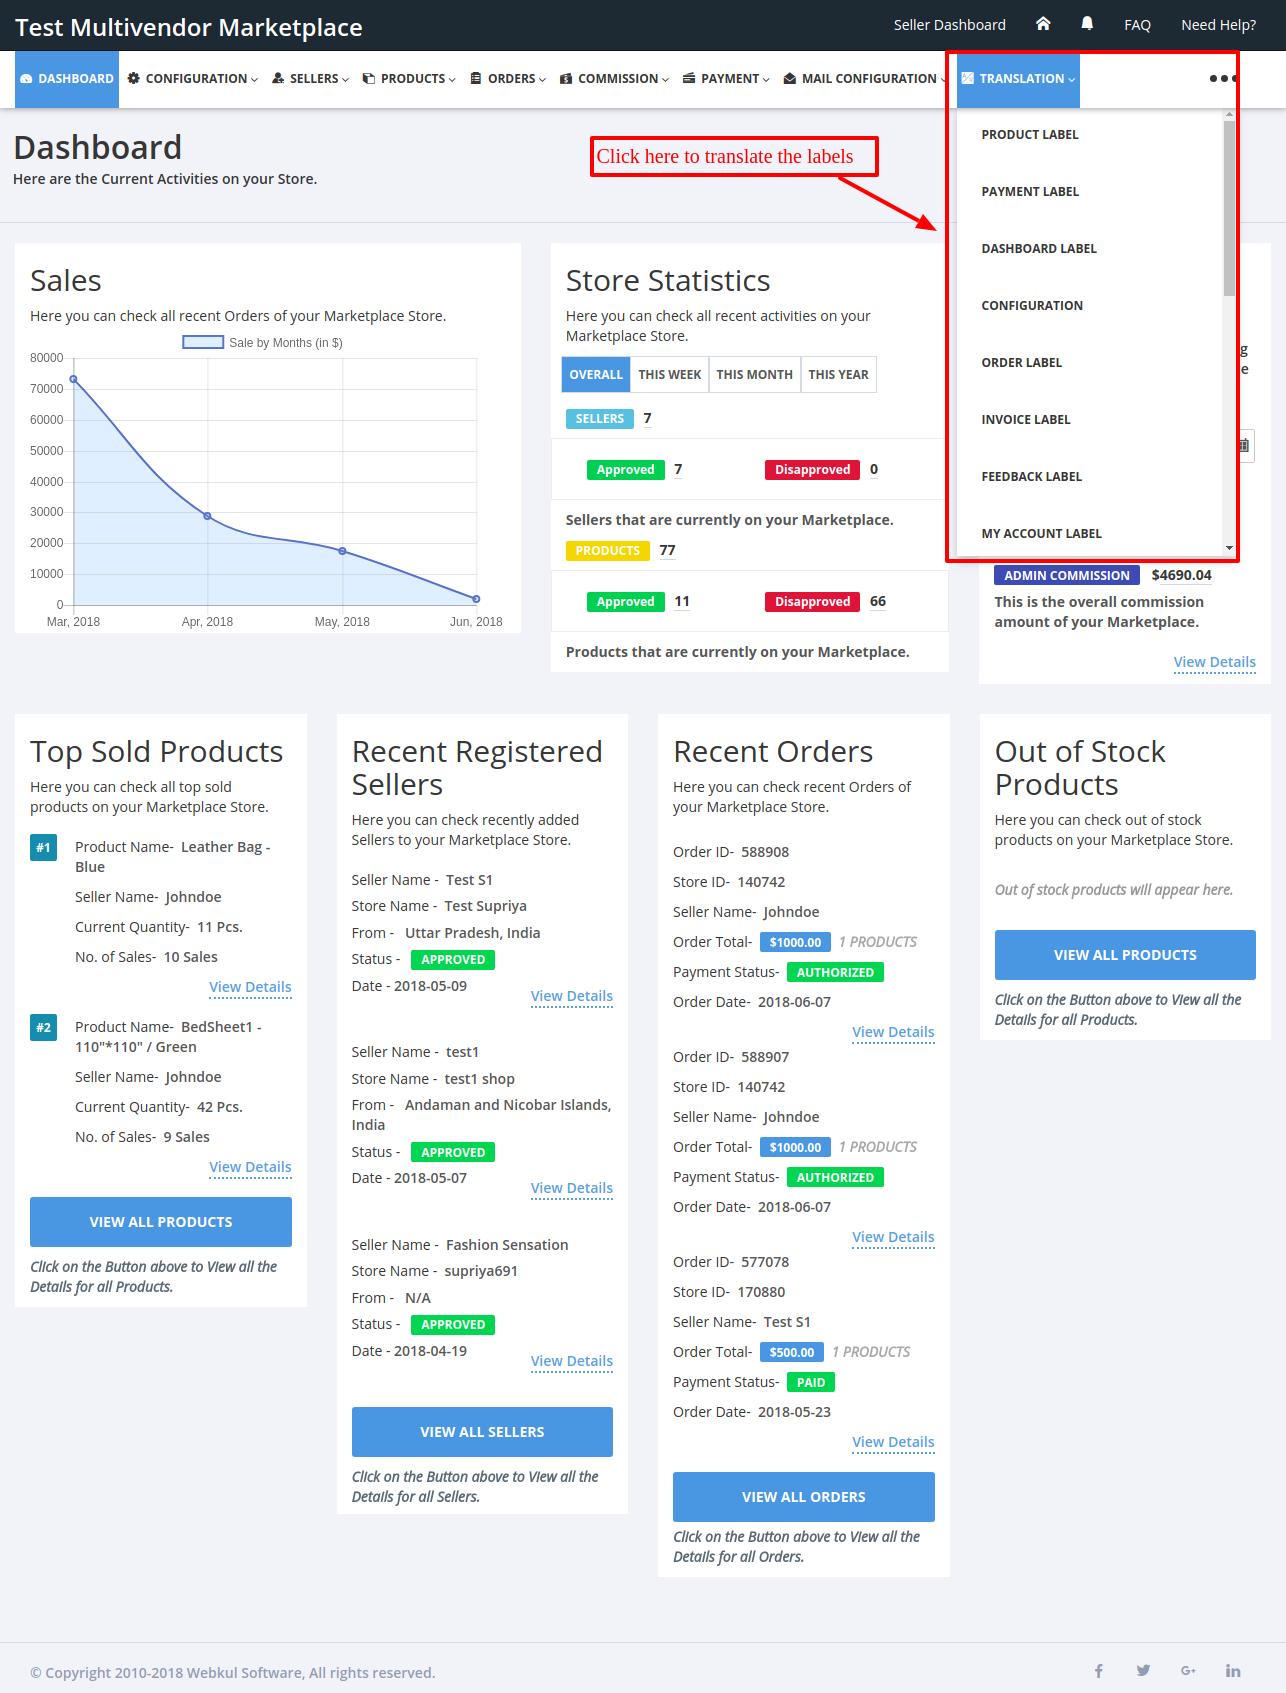 Translate Labels Multivendor Marketplace for Shopify by Webkul